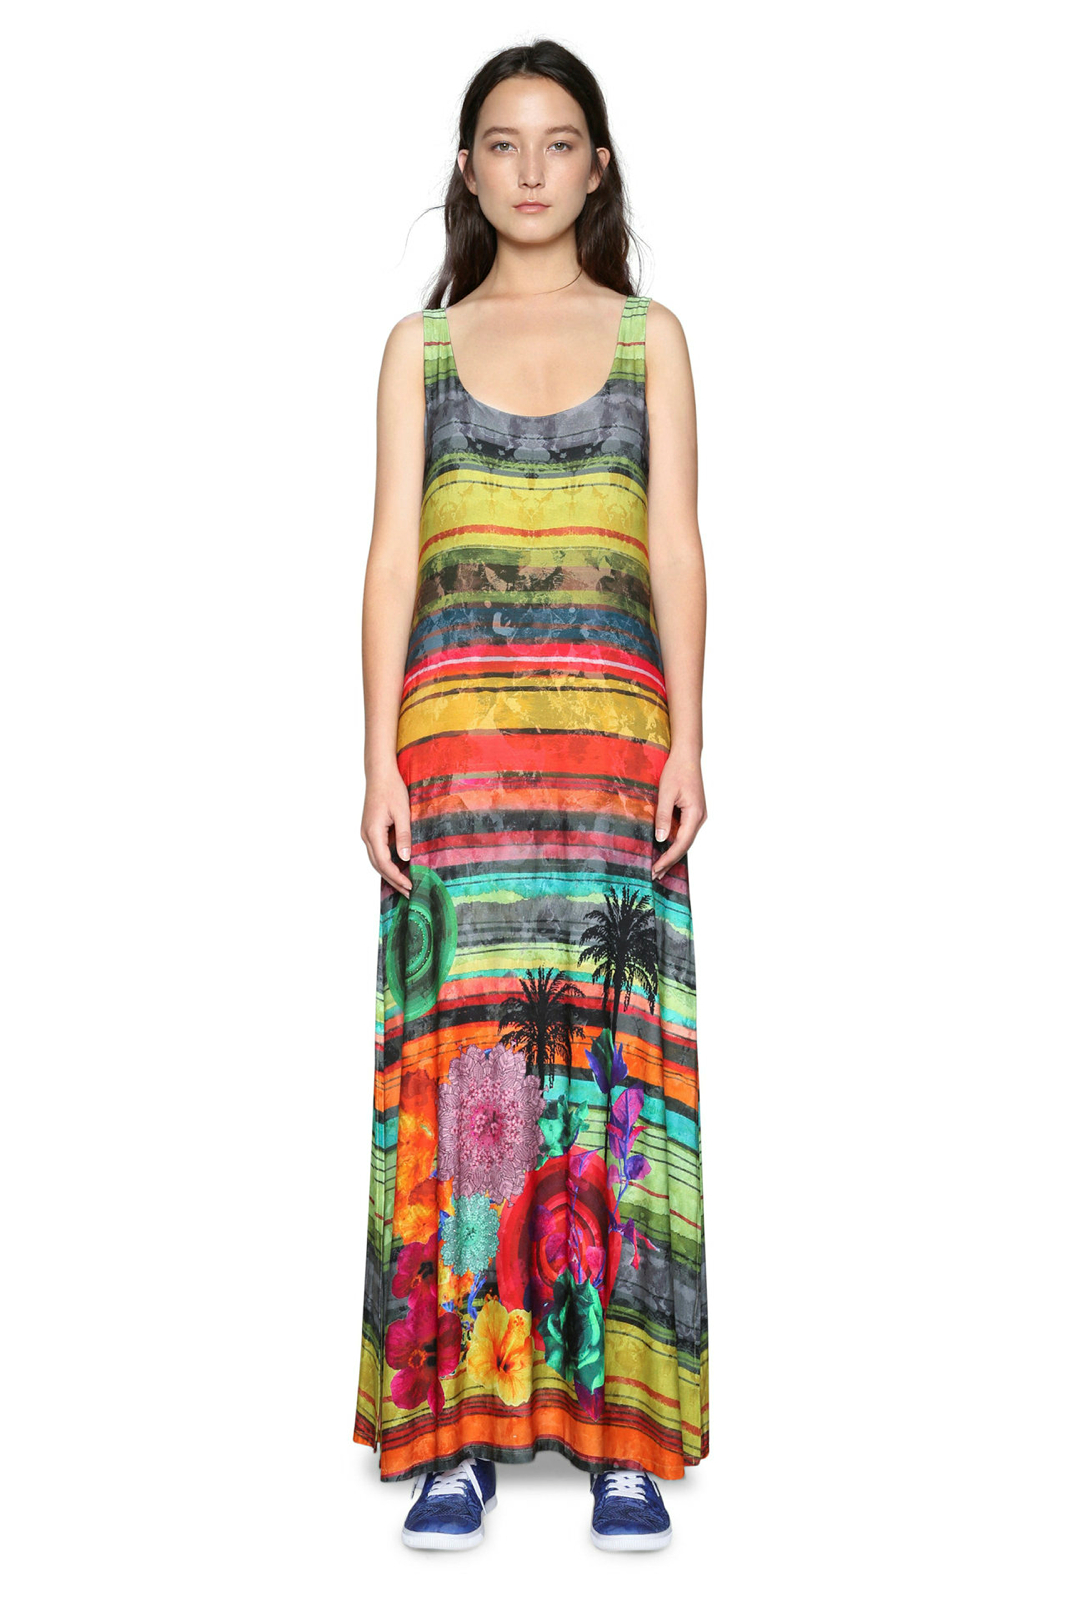 Desigual Lauren Abito Lungo XS-XXL UK 8-18 RRP 94 tropicali a righe colorate